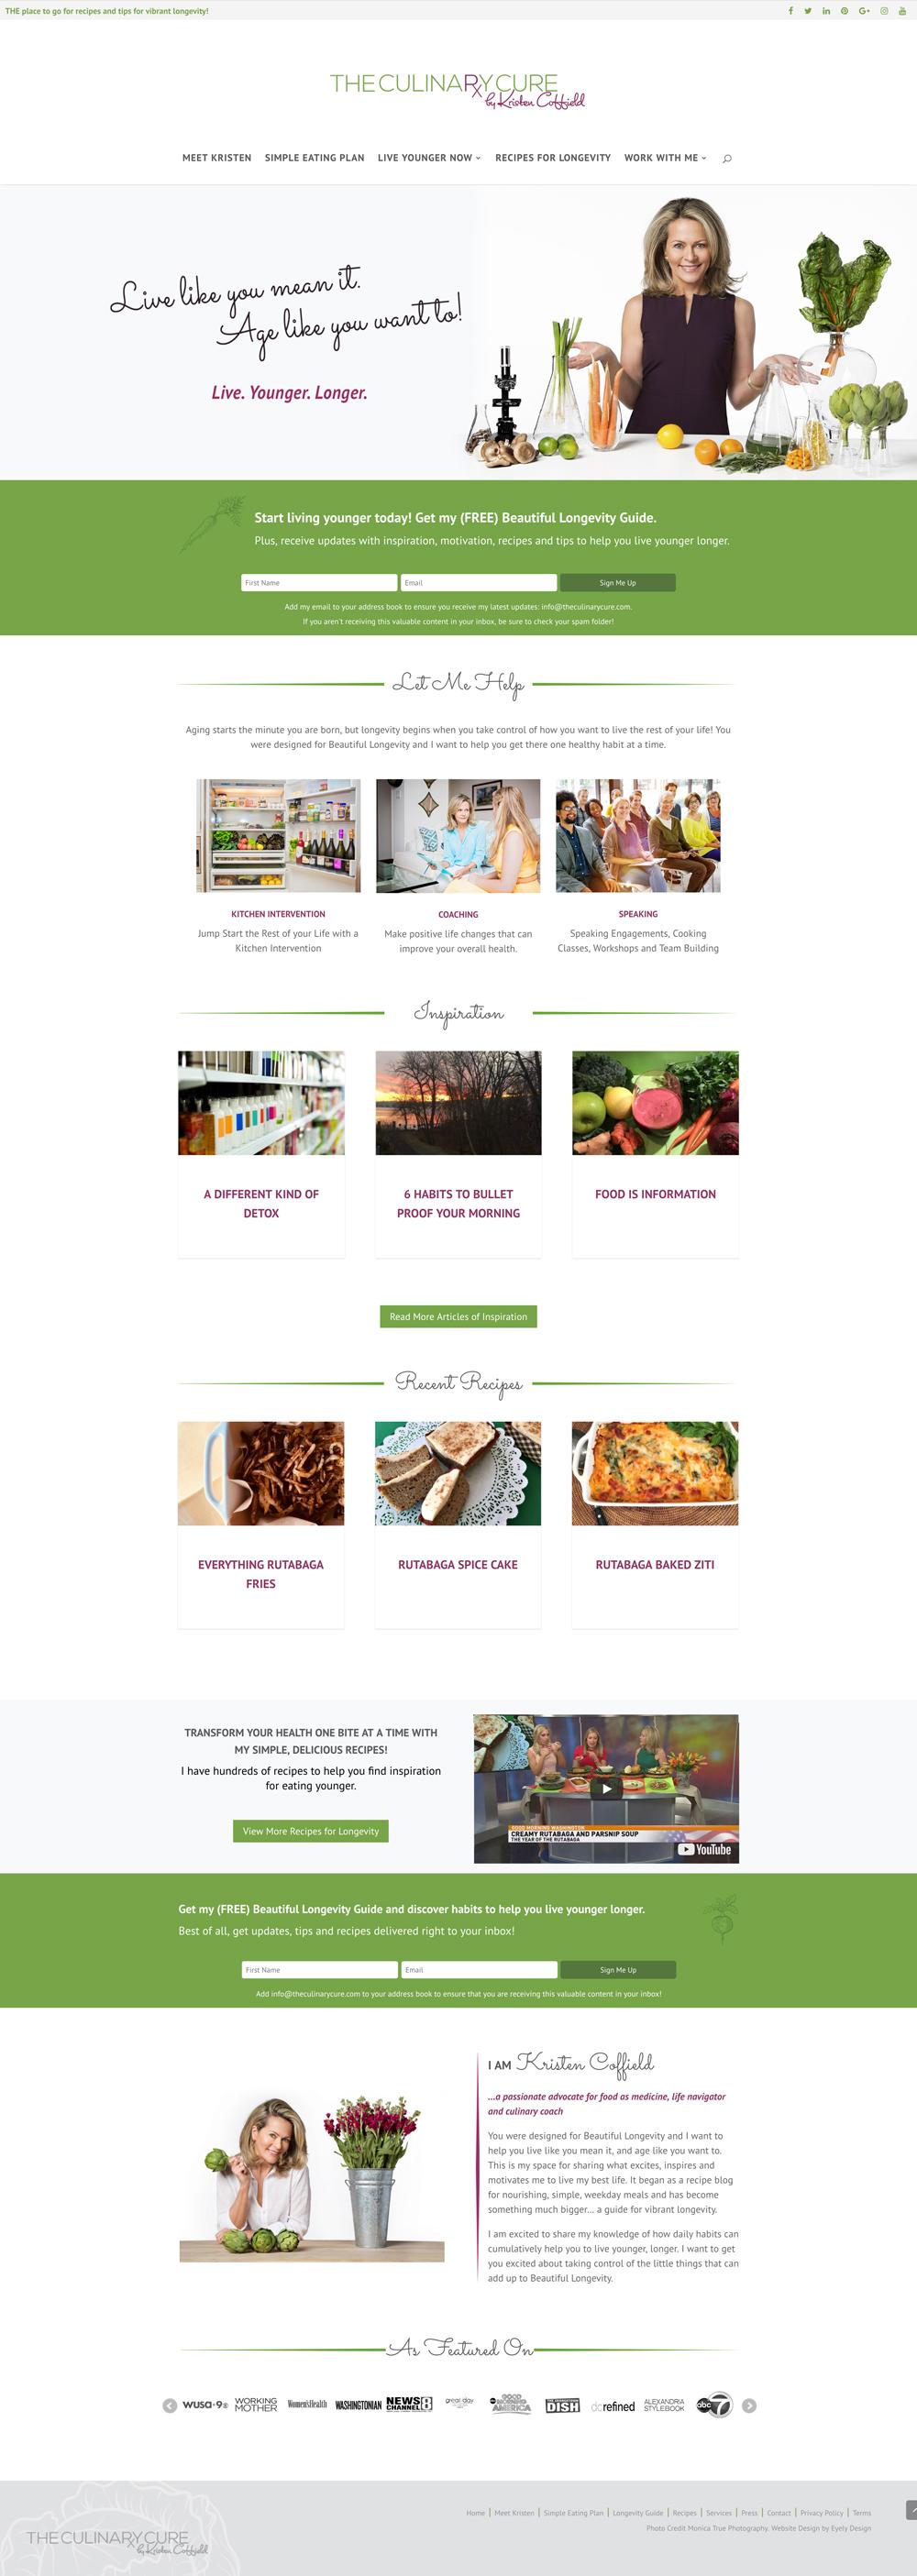 health recipe website design kristen coffield the culinary cure